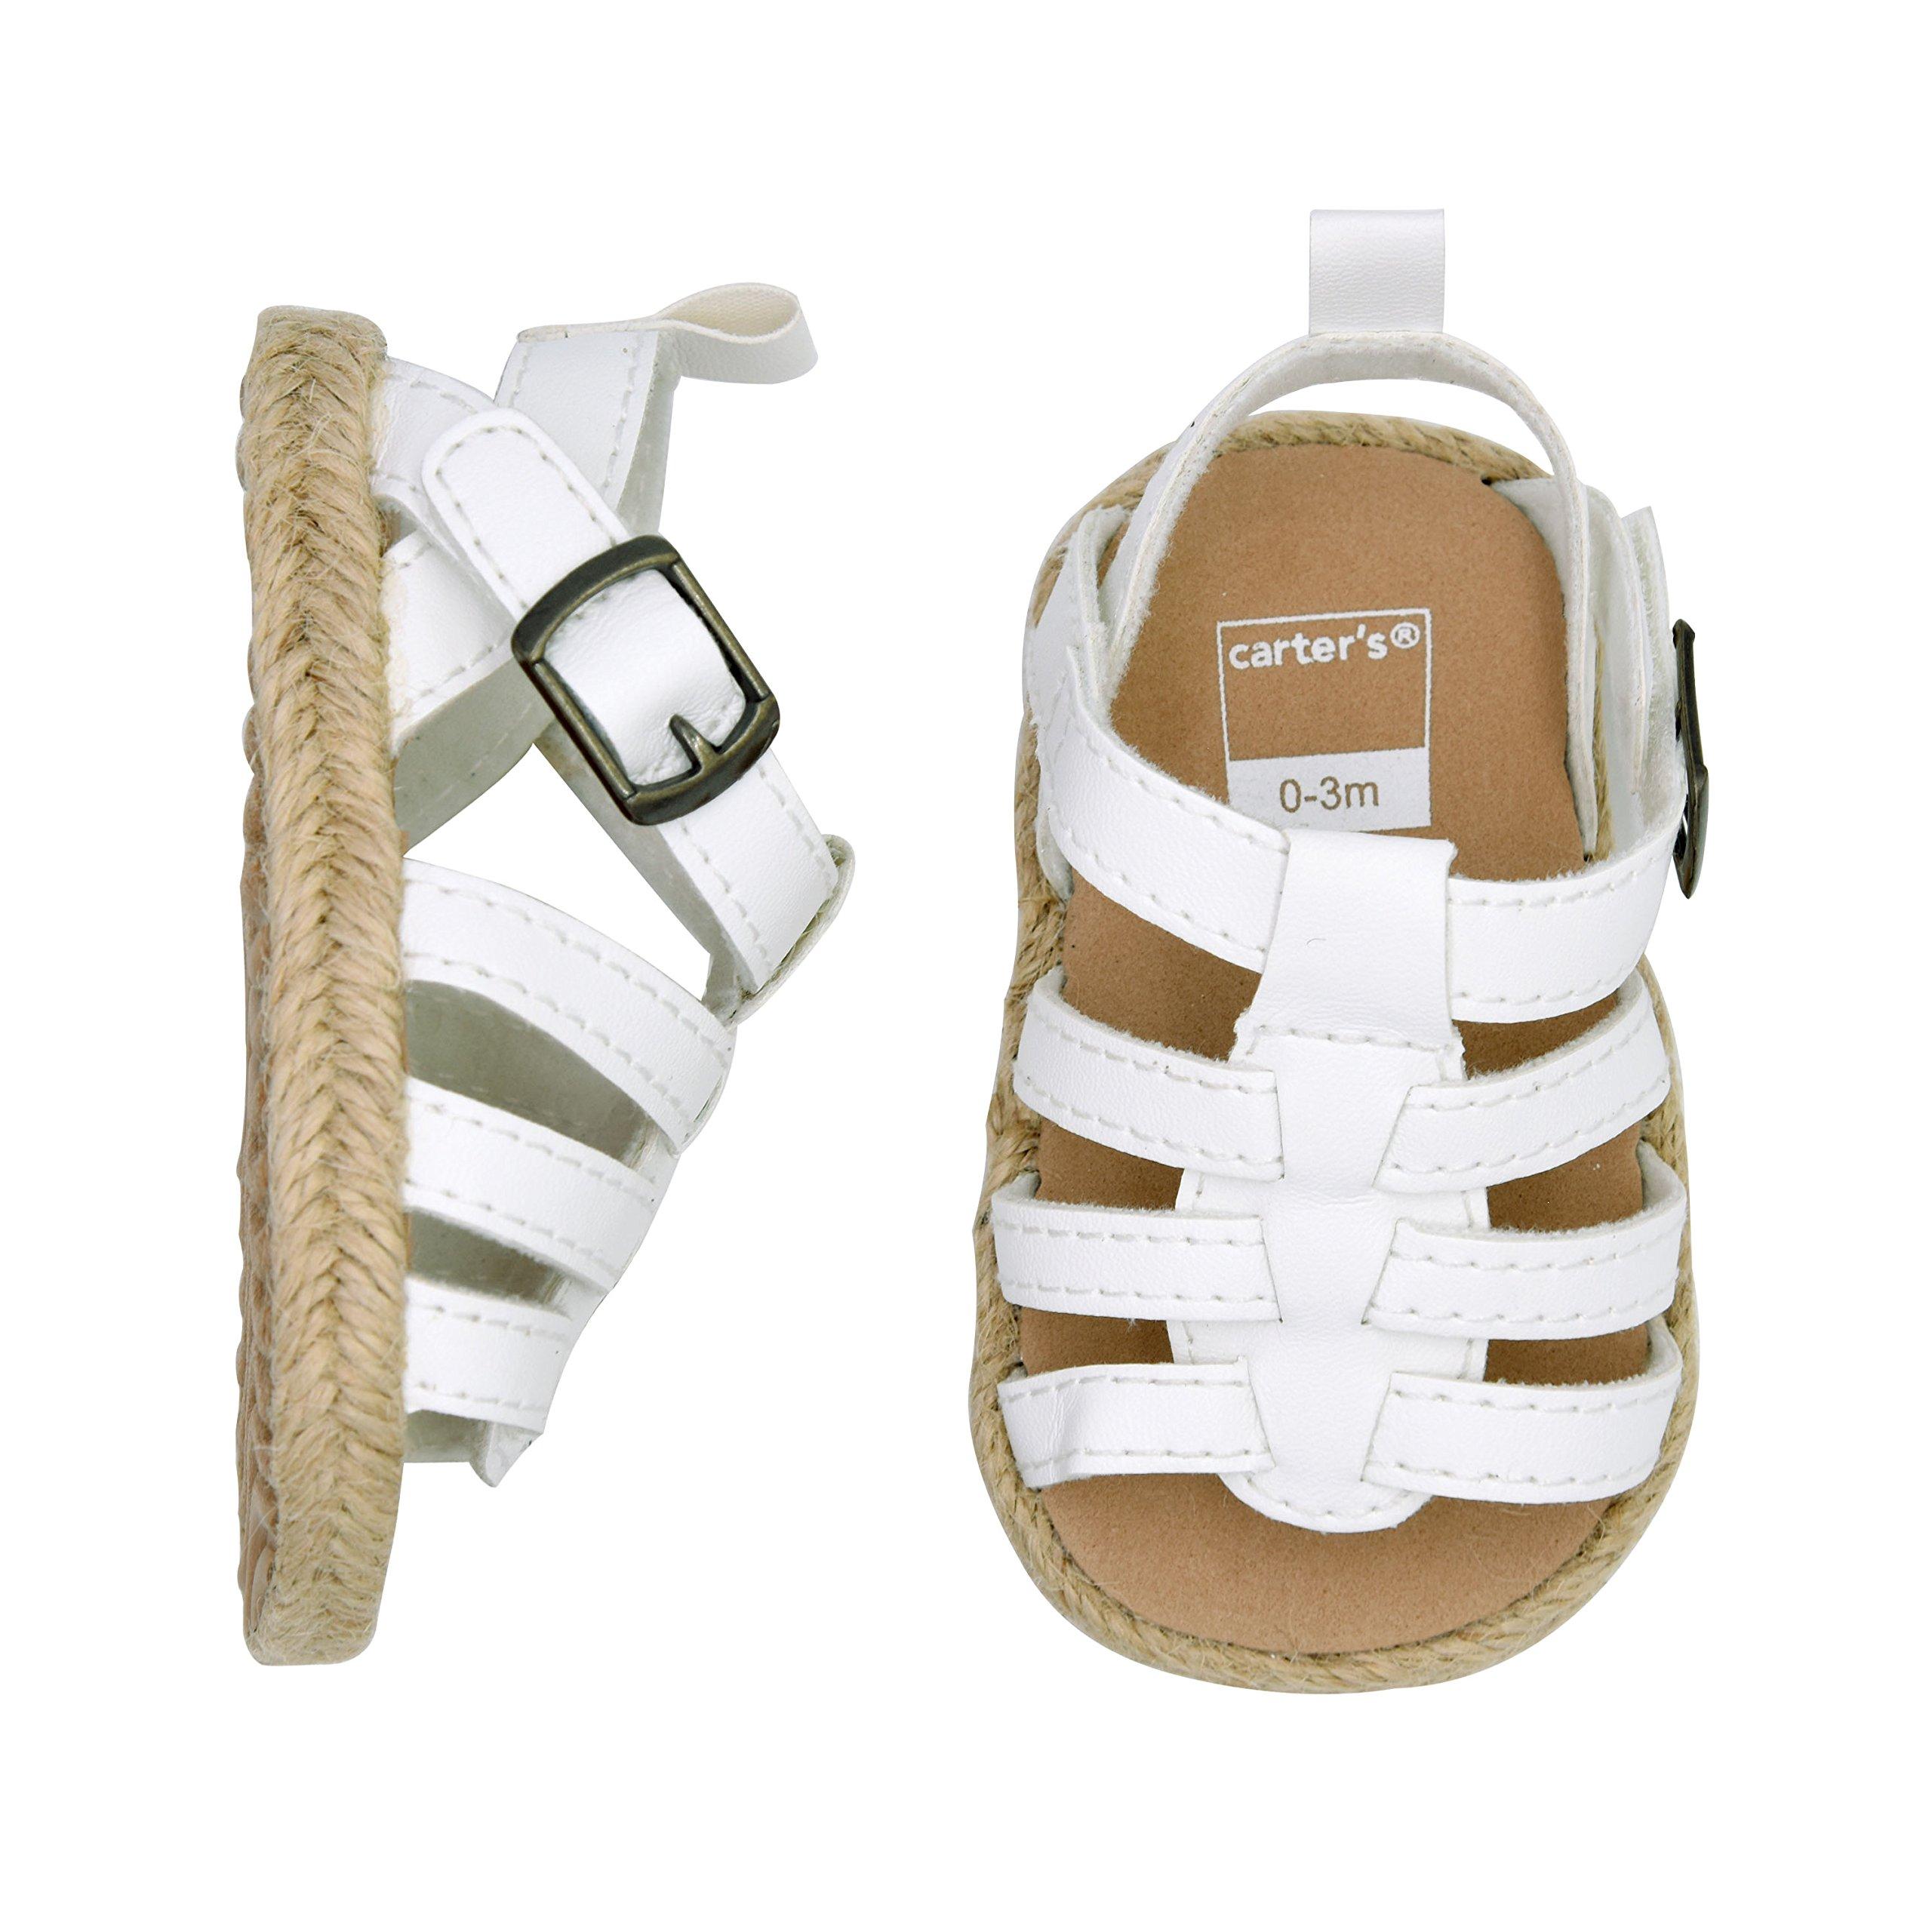 Carter's Girls' Strap Flat Sandal, White, 6-9 Months, Size 3 Regular US Infant